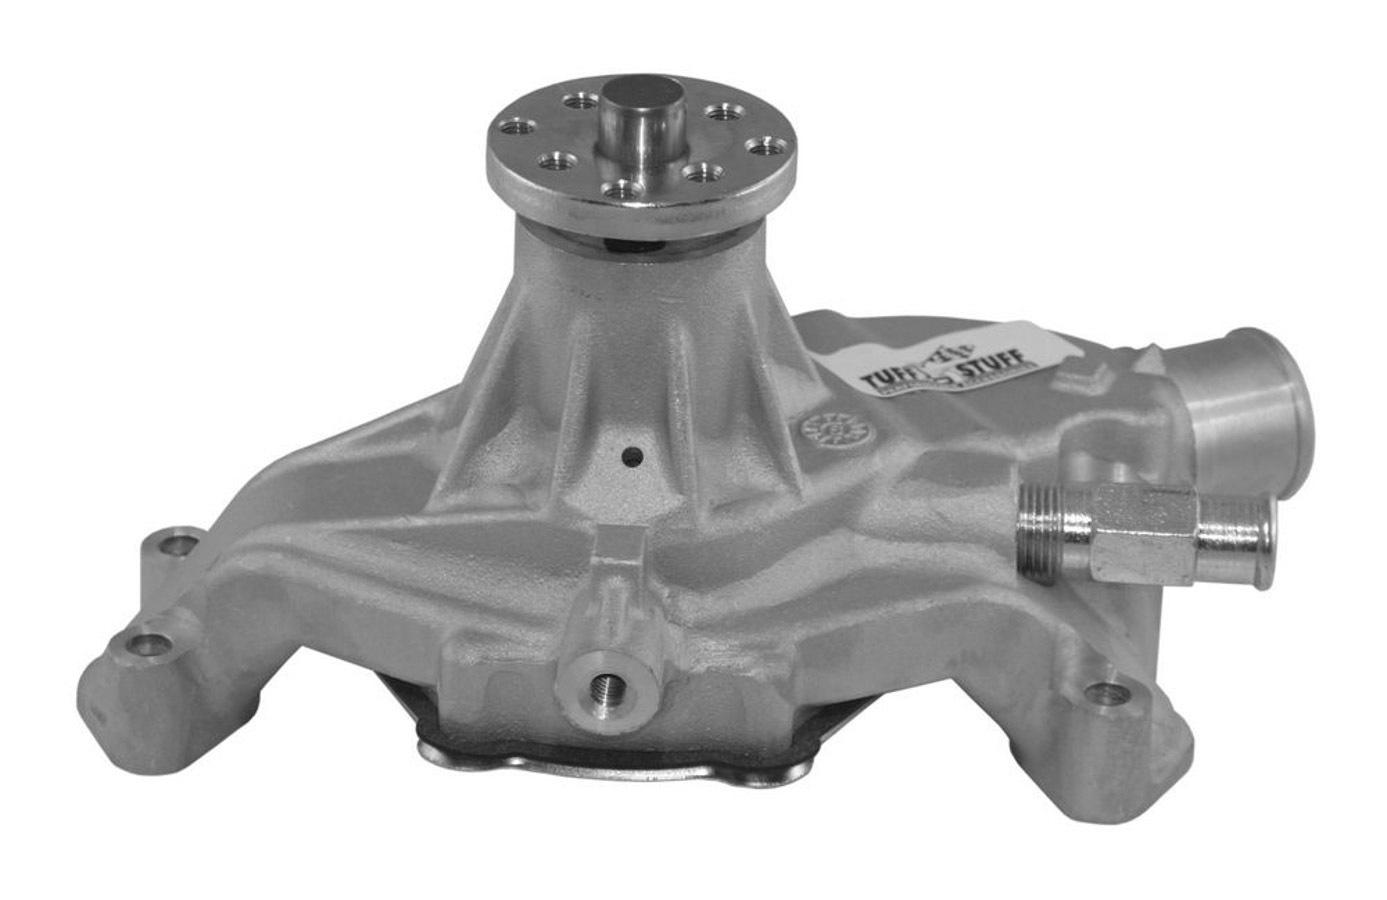 Tuff-Stuff 1635E Water Pump, Mechanical, Economy, Short Design, Aluminum, Natural, Small Block Chevy, Each